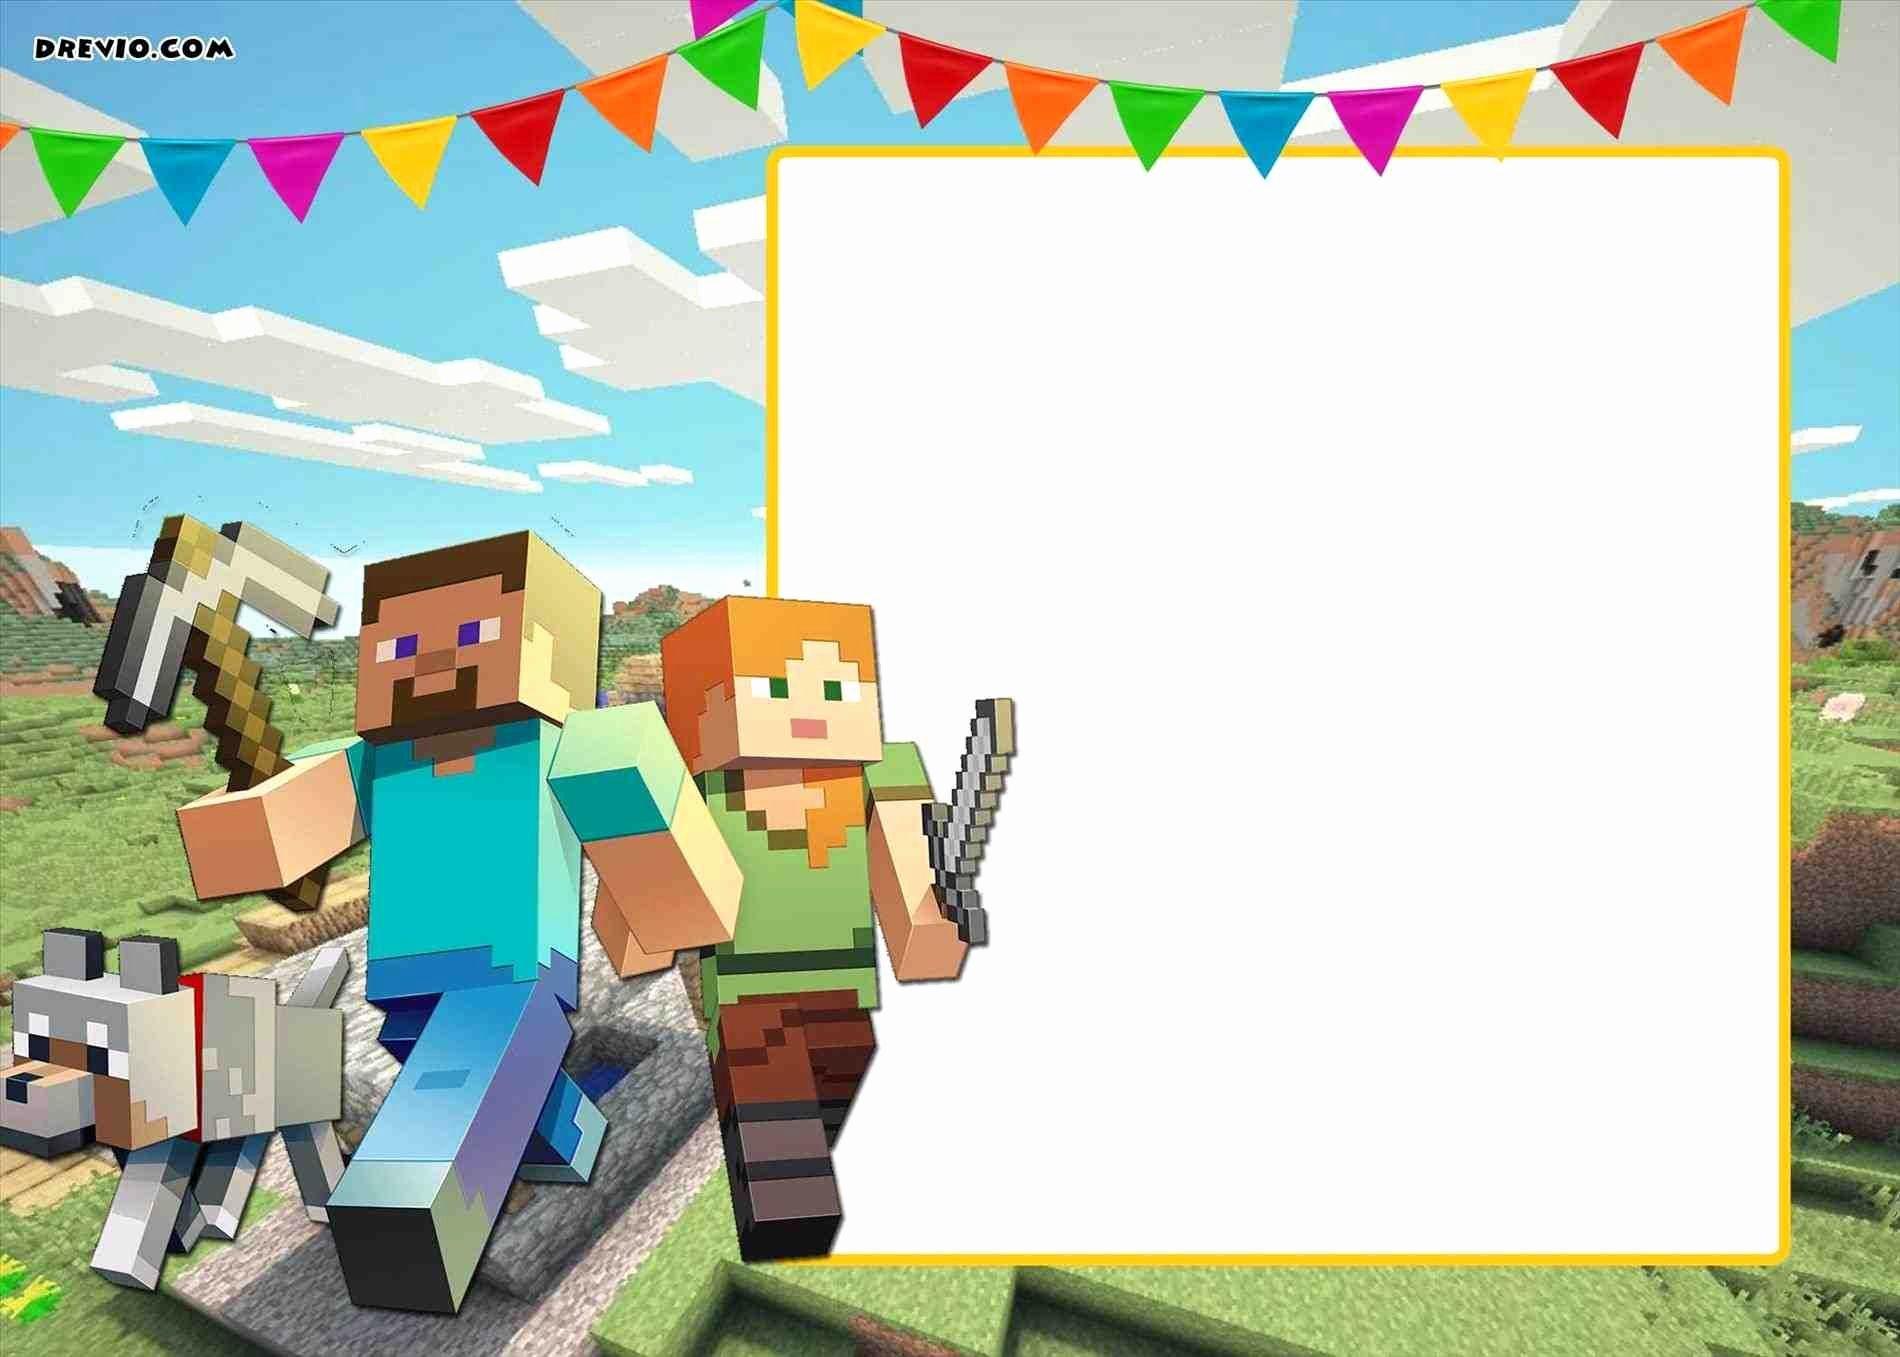 Minecraft Birthday Invite Template New Minecraft Birthday Party Ideas and Invitations Minecraft